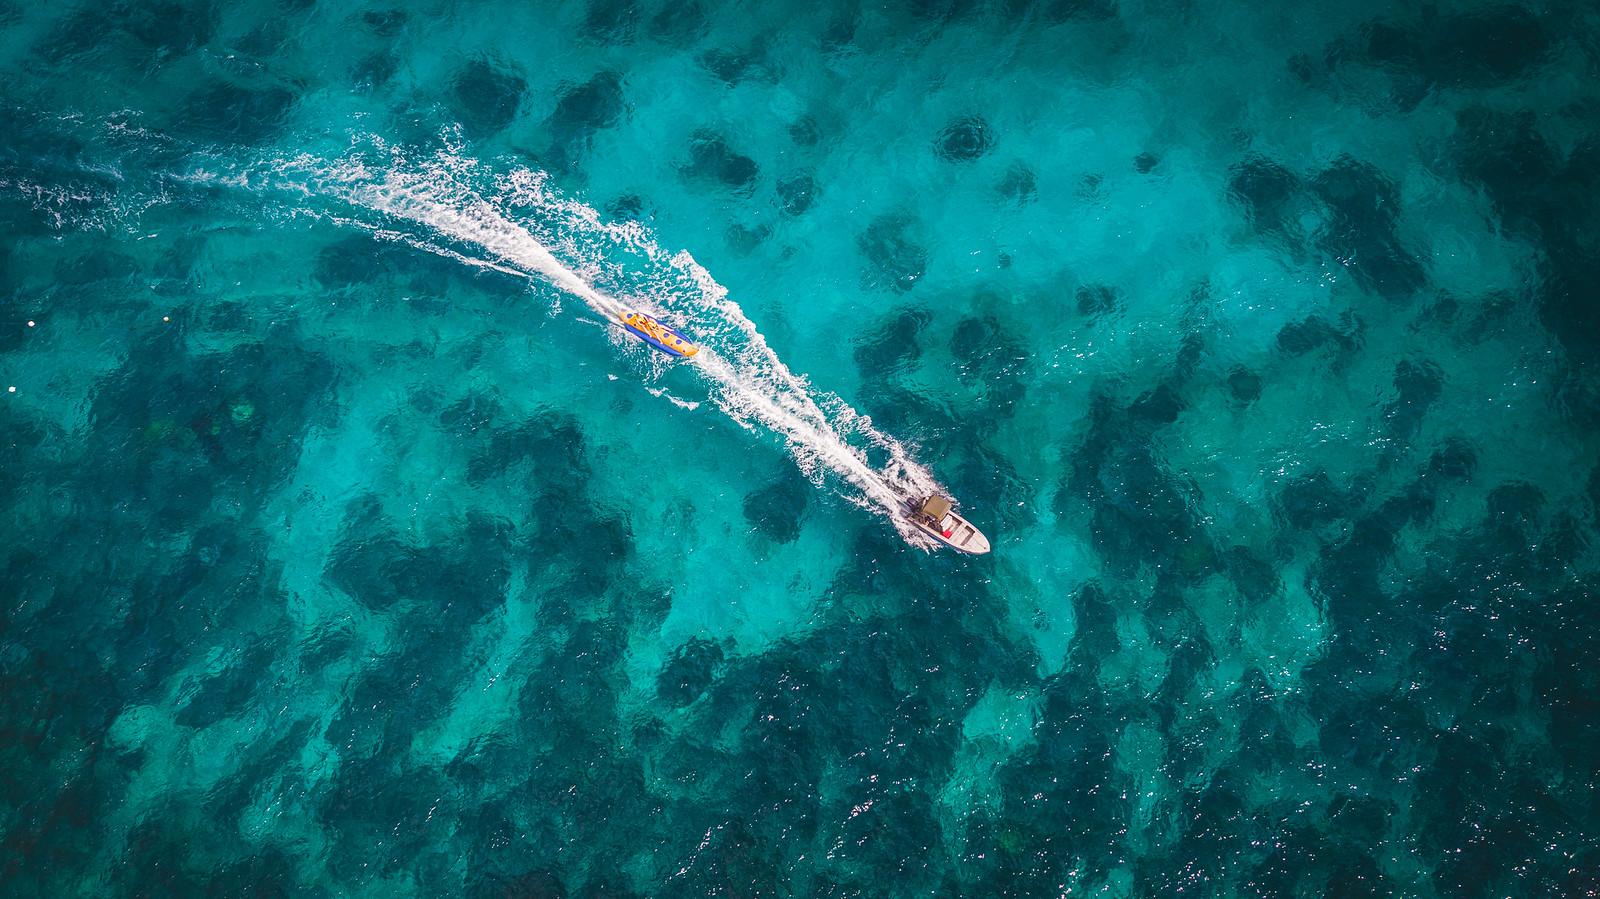 Bali Hai BananaBoat - Bali Drone production